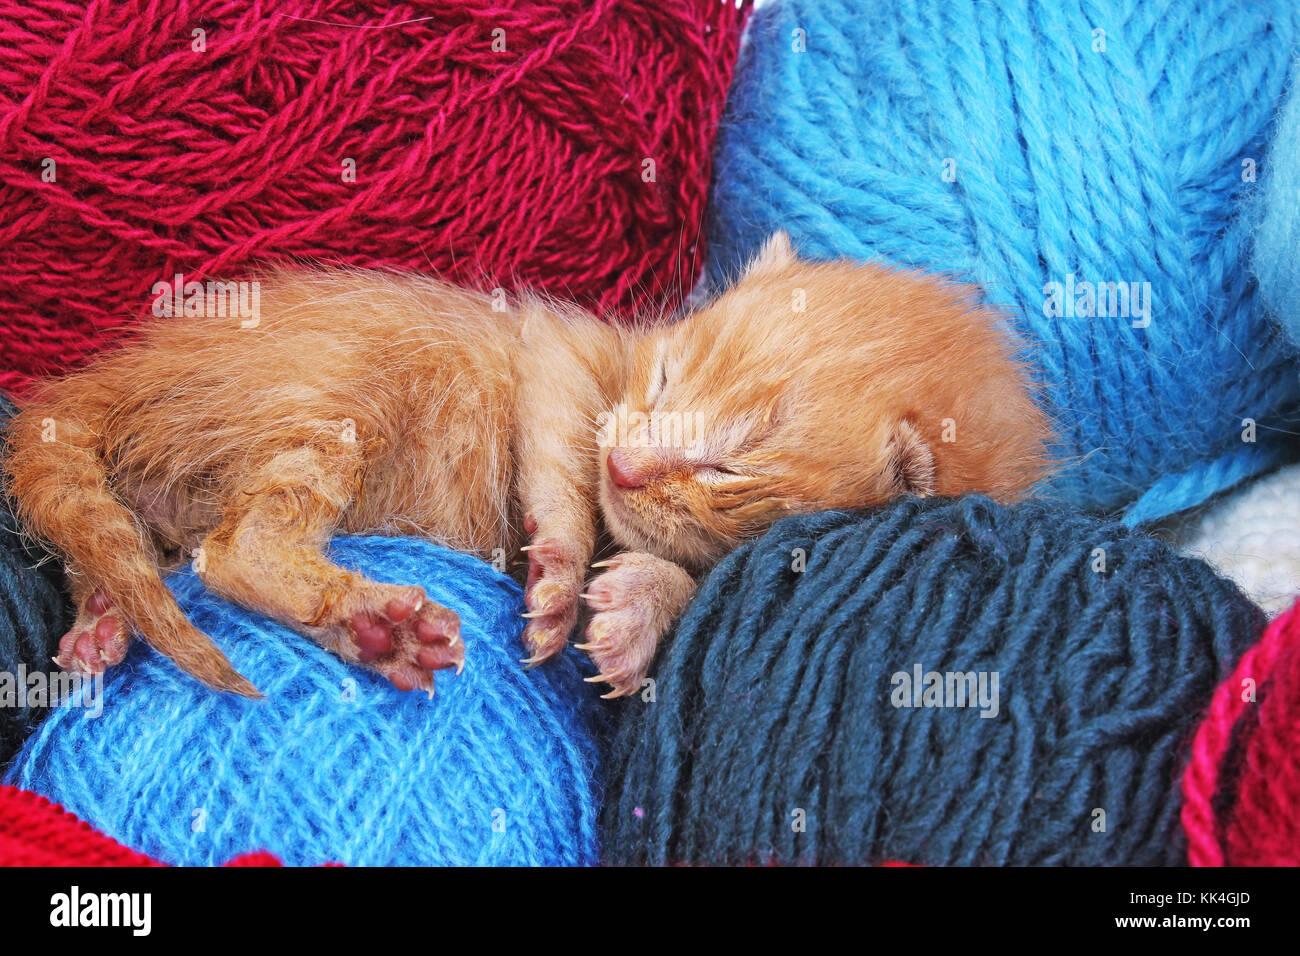 New Born Baby Cat Sleeping Cute Beautiful Little Few Days Old Orange Stock Photo Alamy